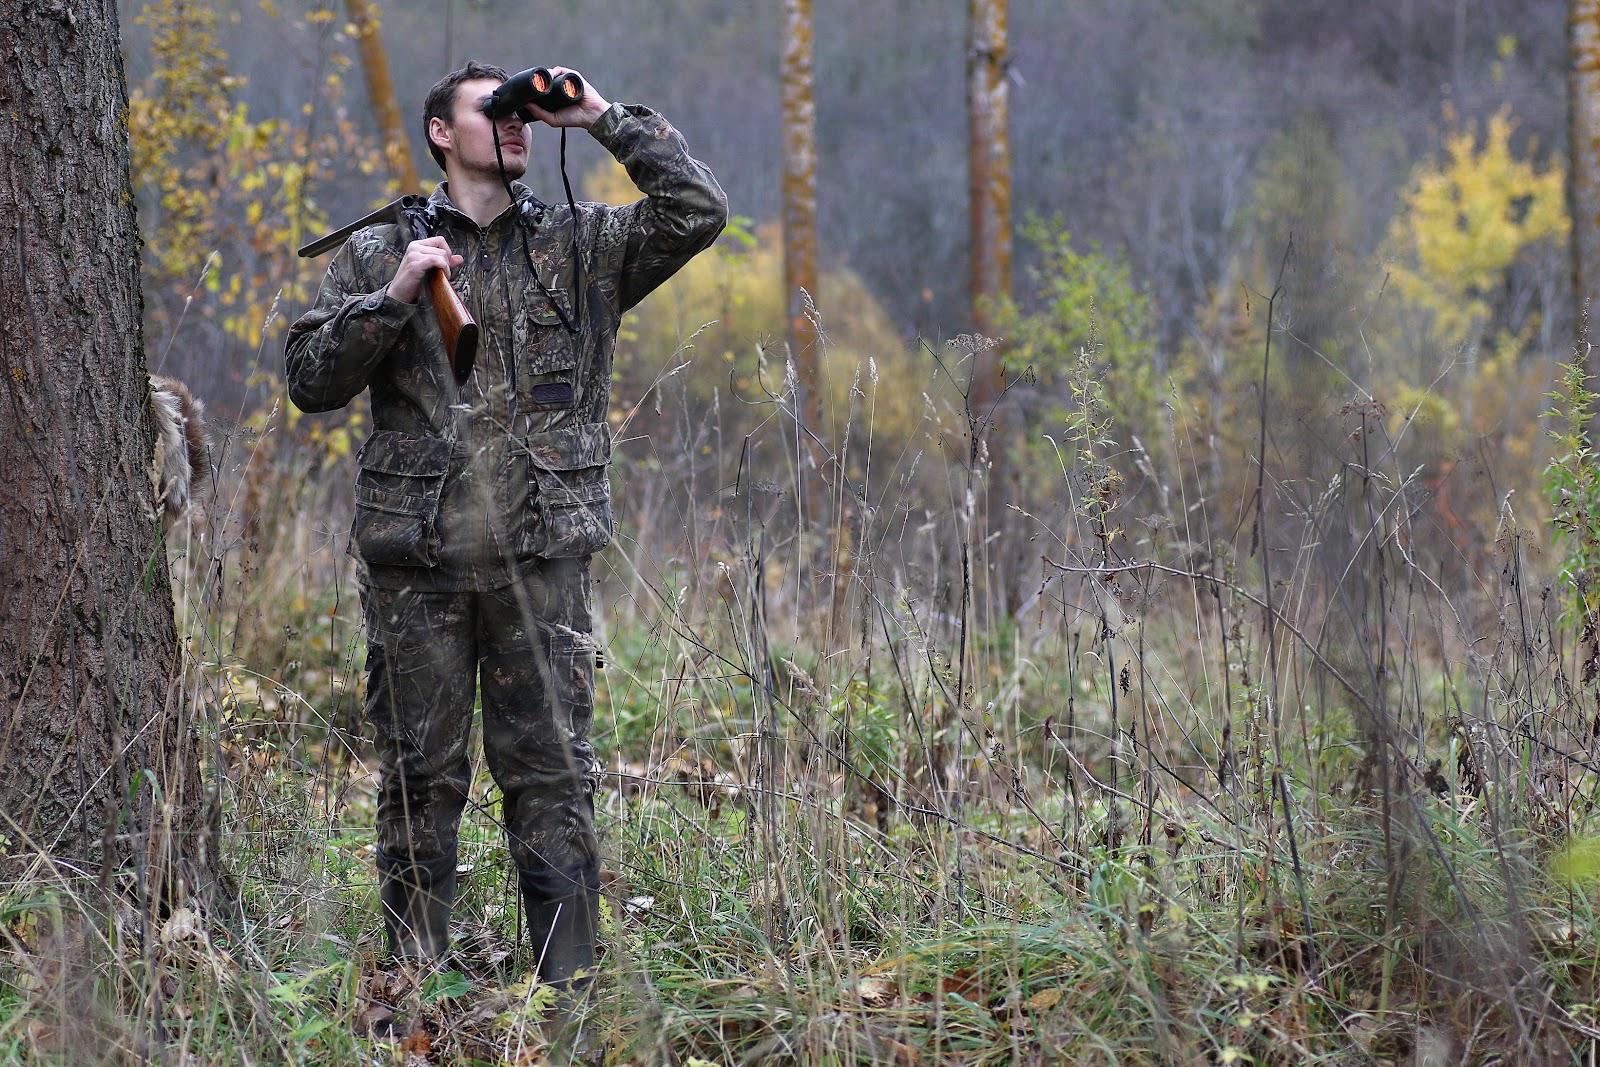 spotting a bird